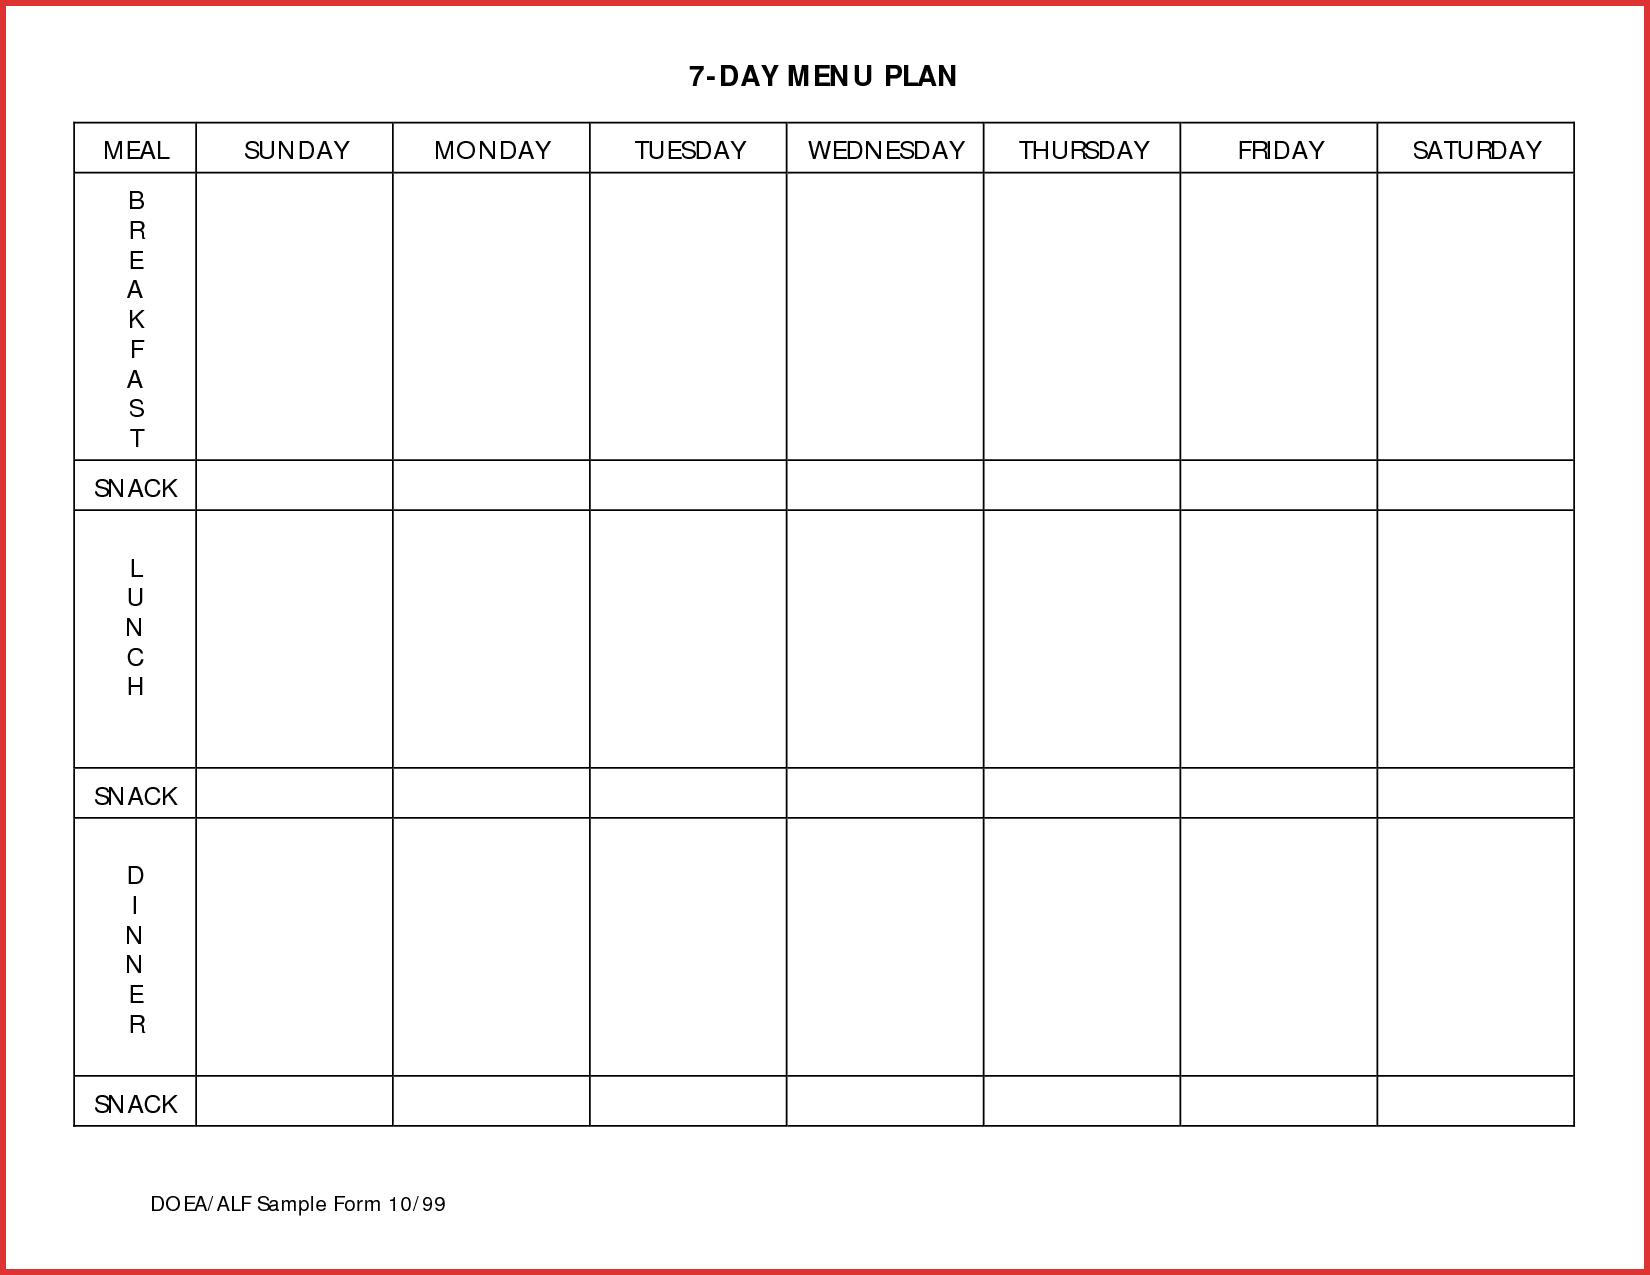 014 Meal Planning Calendar Template Plan Templates Day Menu Planner for 7 Day Calendar Template Free